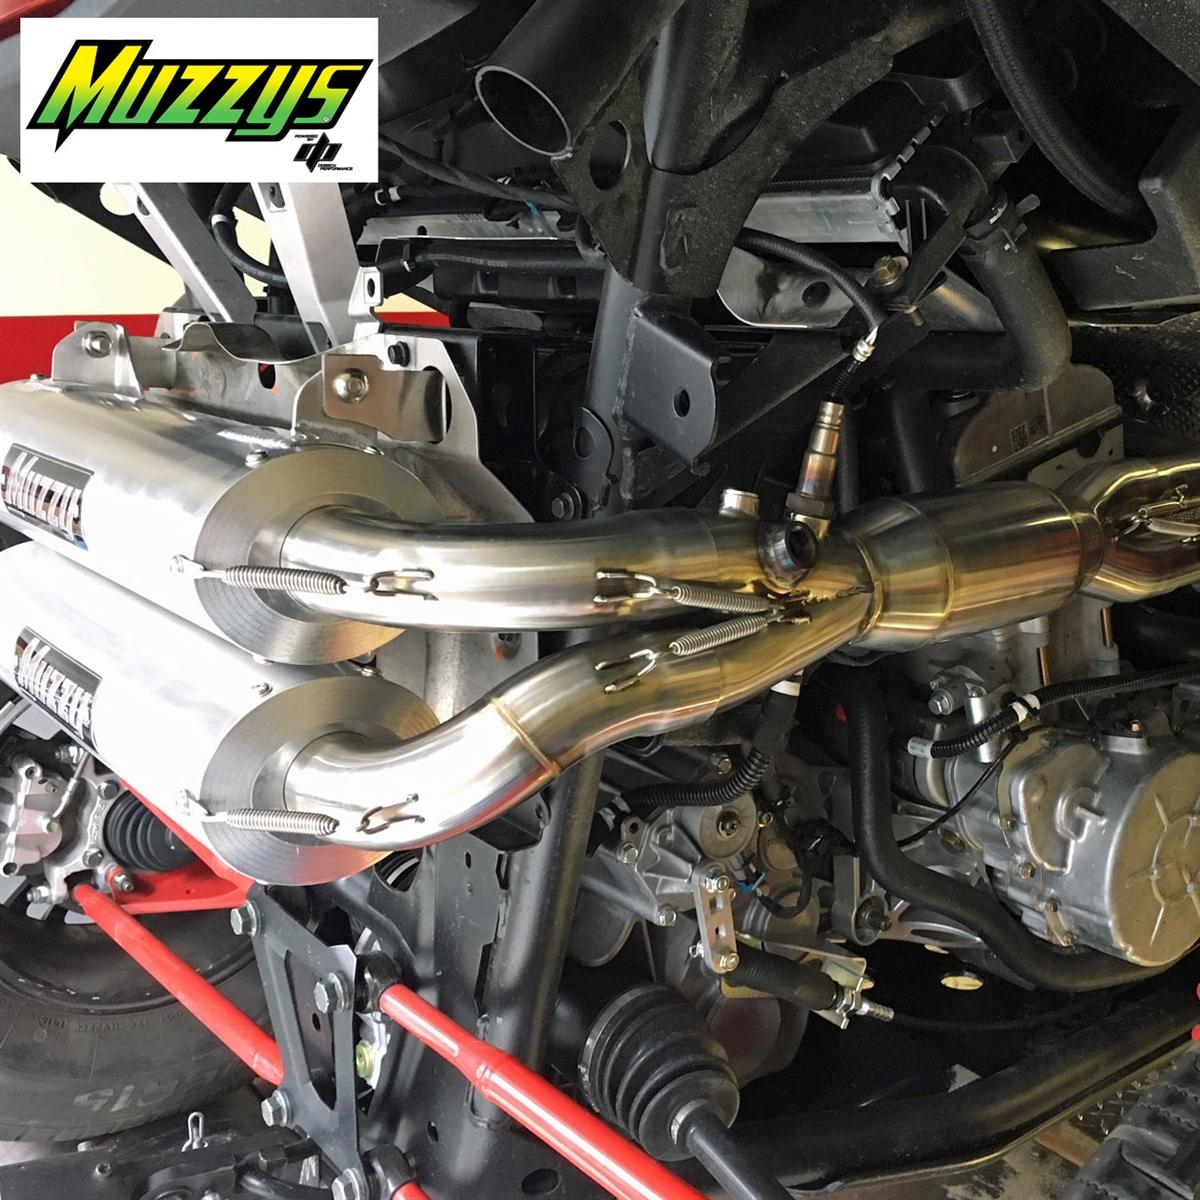 Muzzy's Polaris RZR XP1000 / RS1 Full Exhaust System